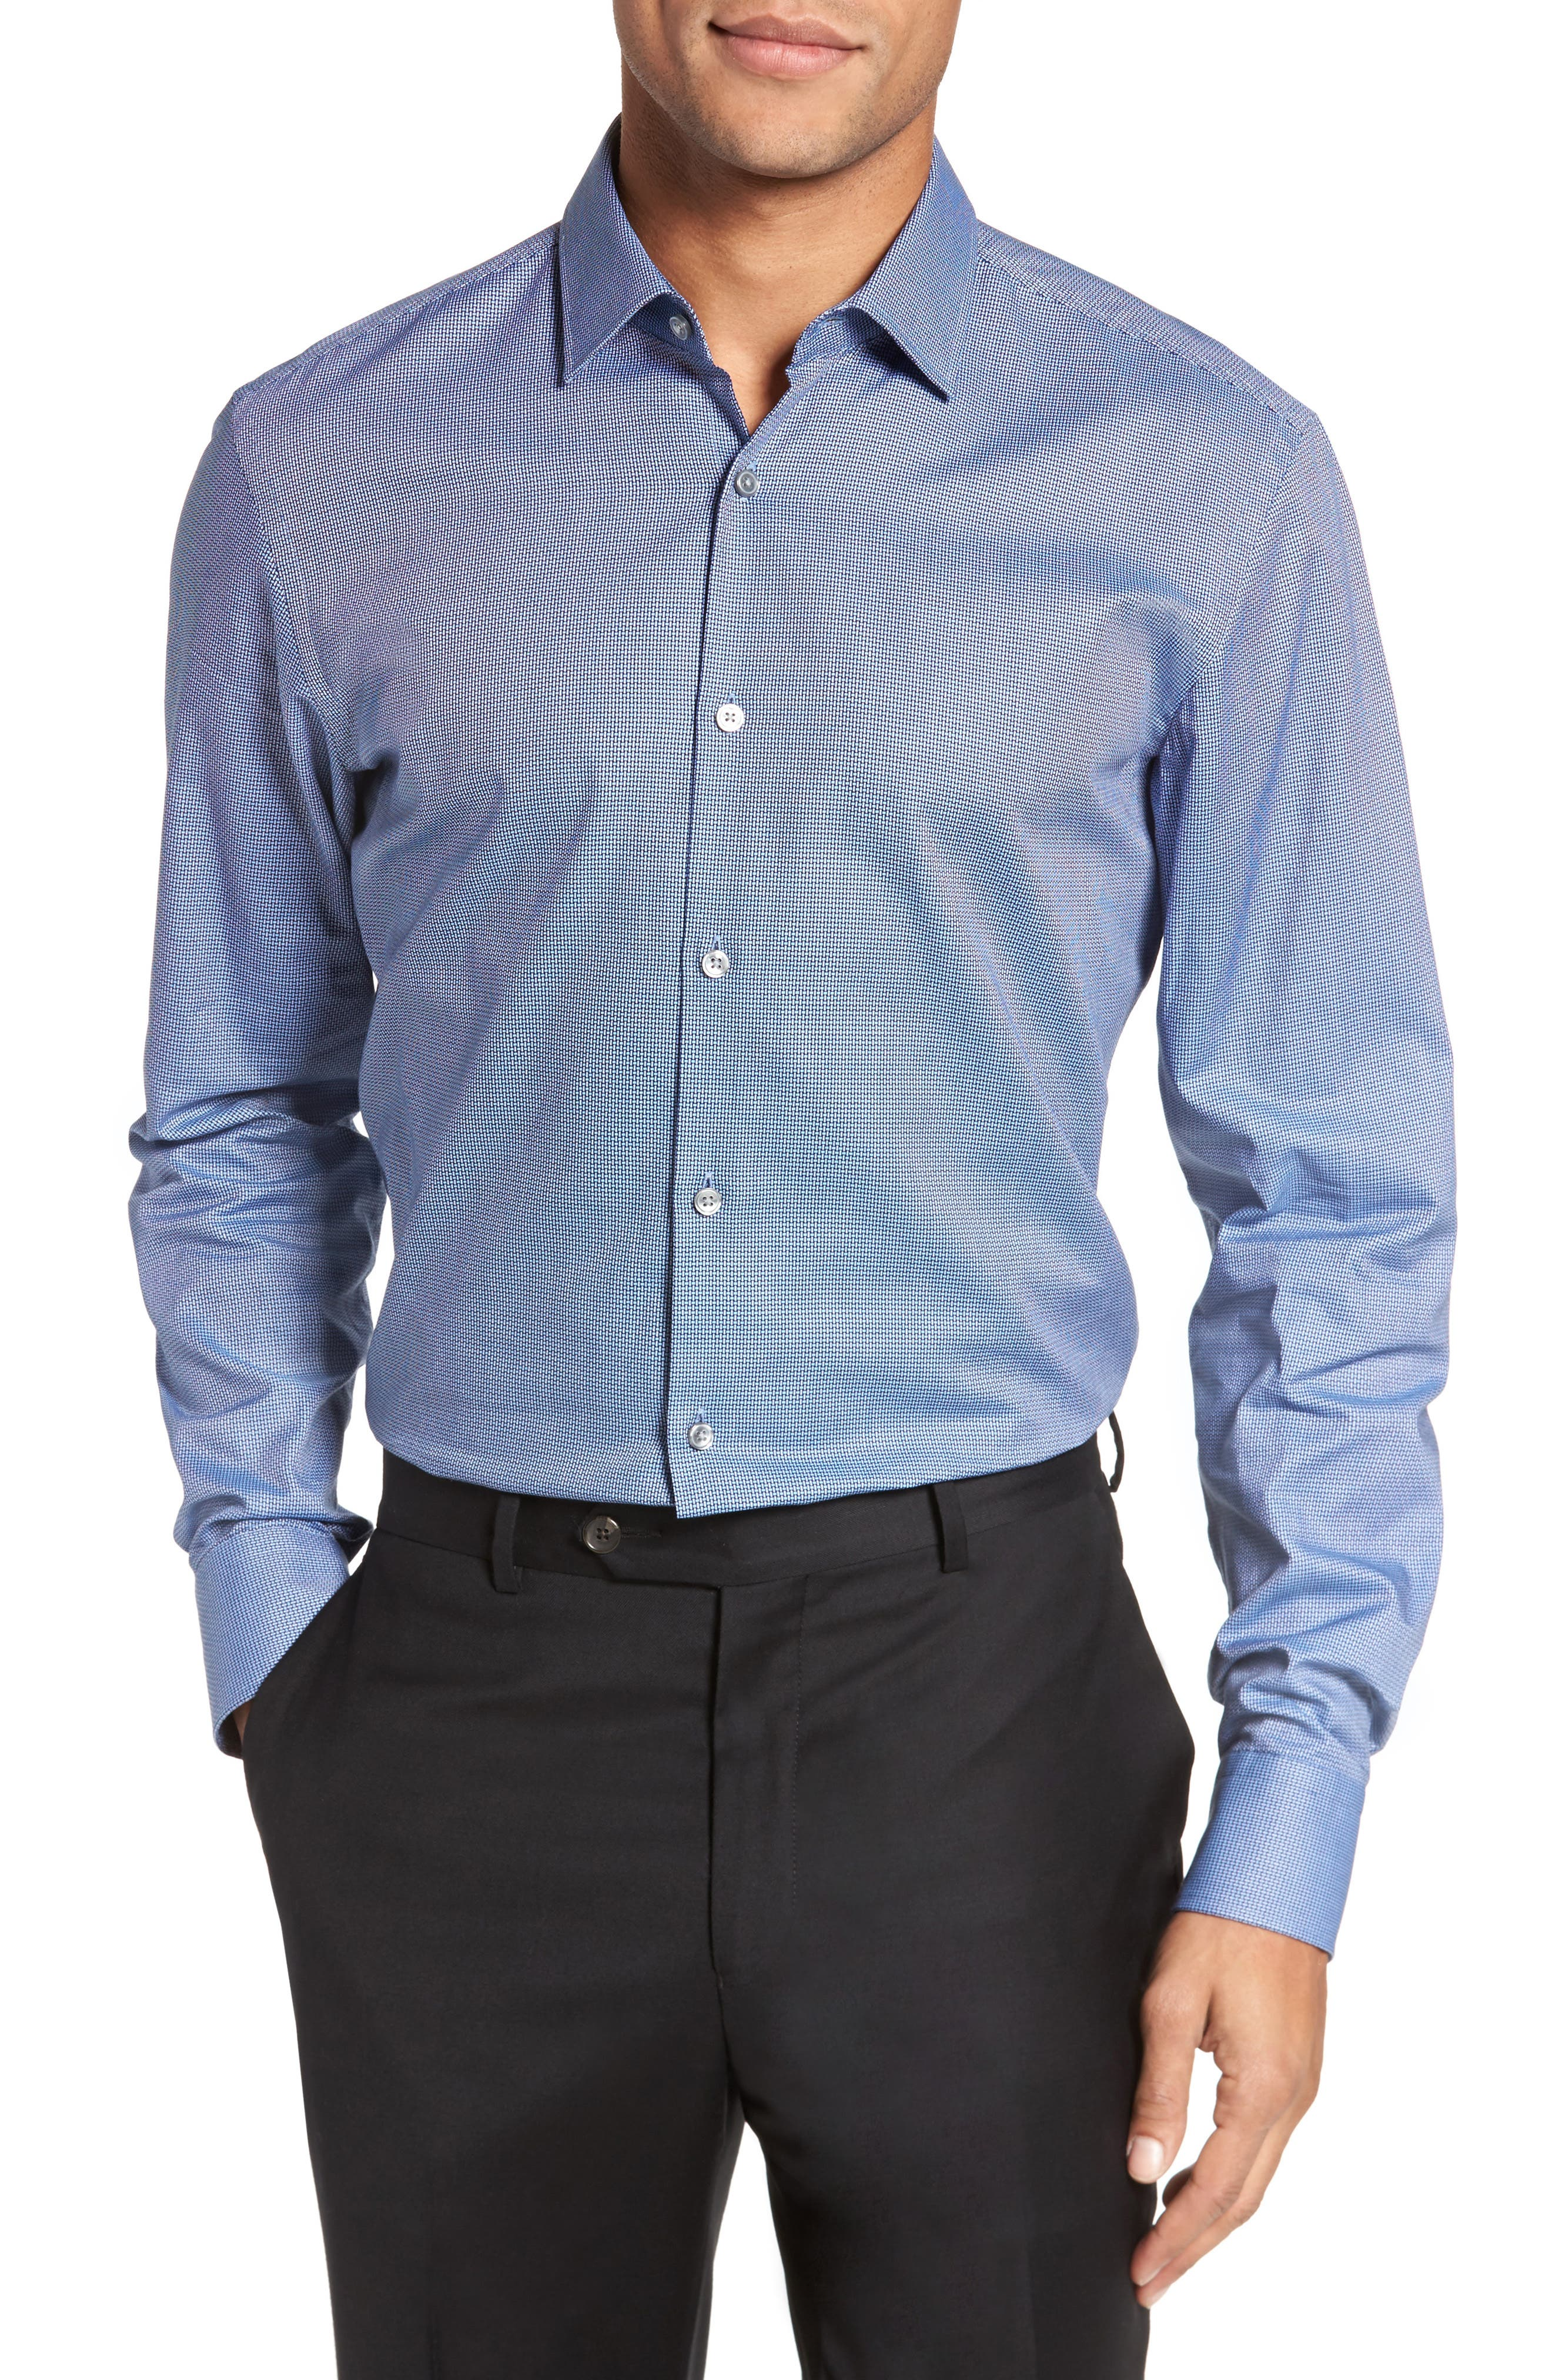 Marley Sharp Fit Solid Dress Shirt,                         Main,                         color, 410